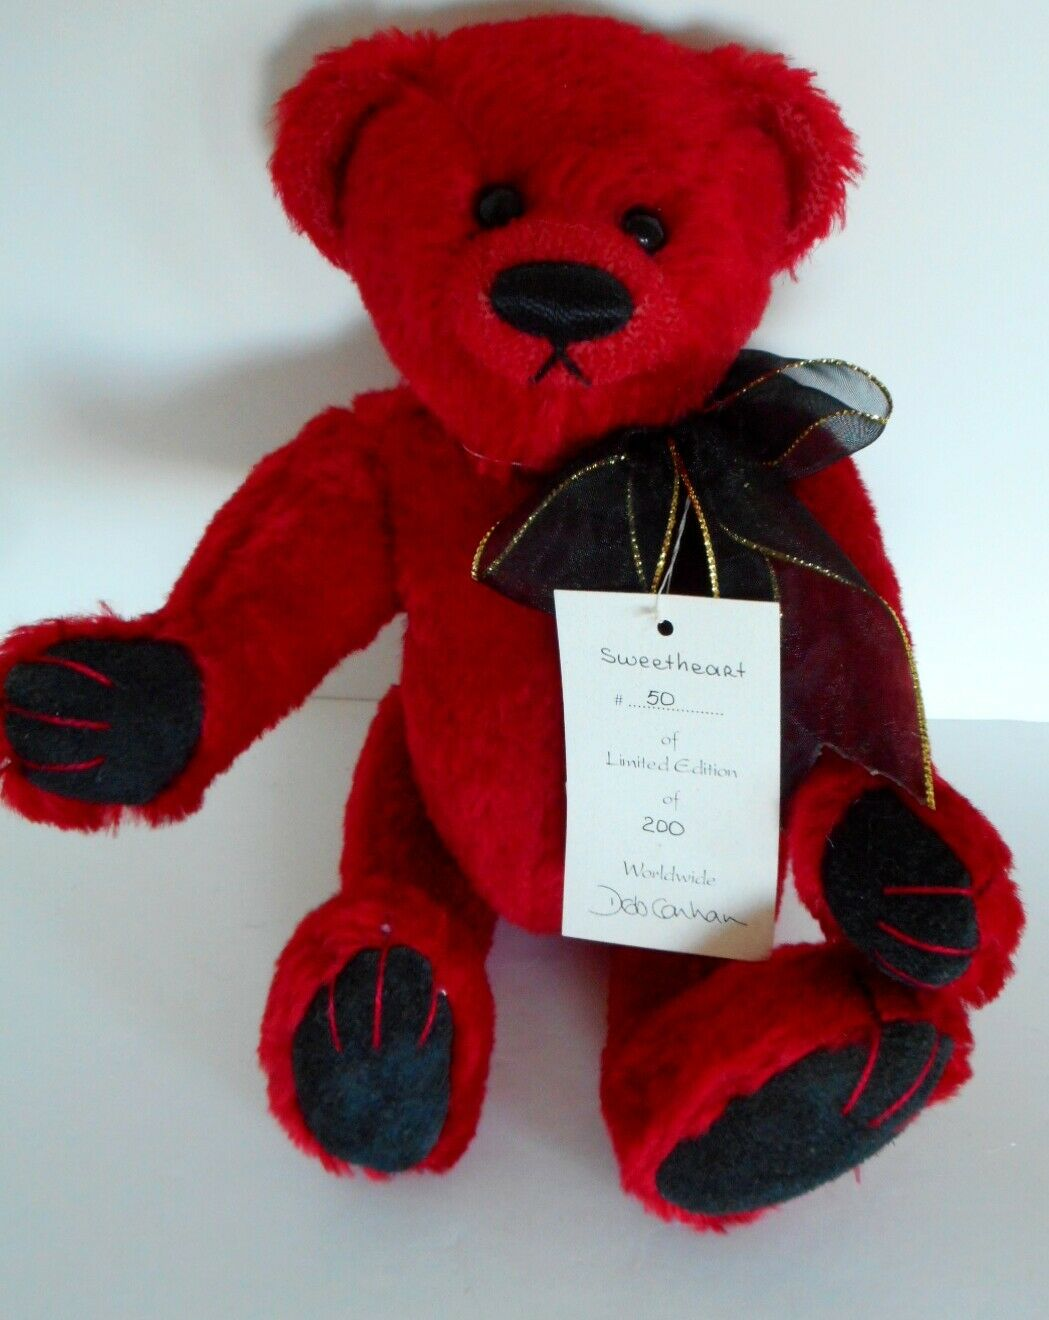 Deb Canham Bigger Bear  Sweetheart , 11 Inches, Jointed MWT 50/200